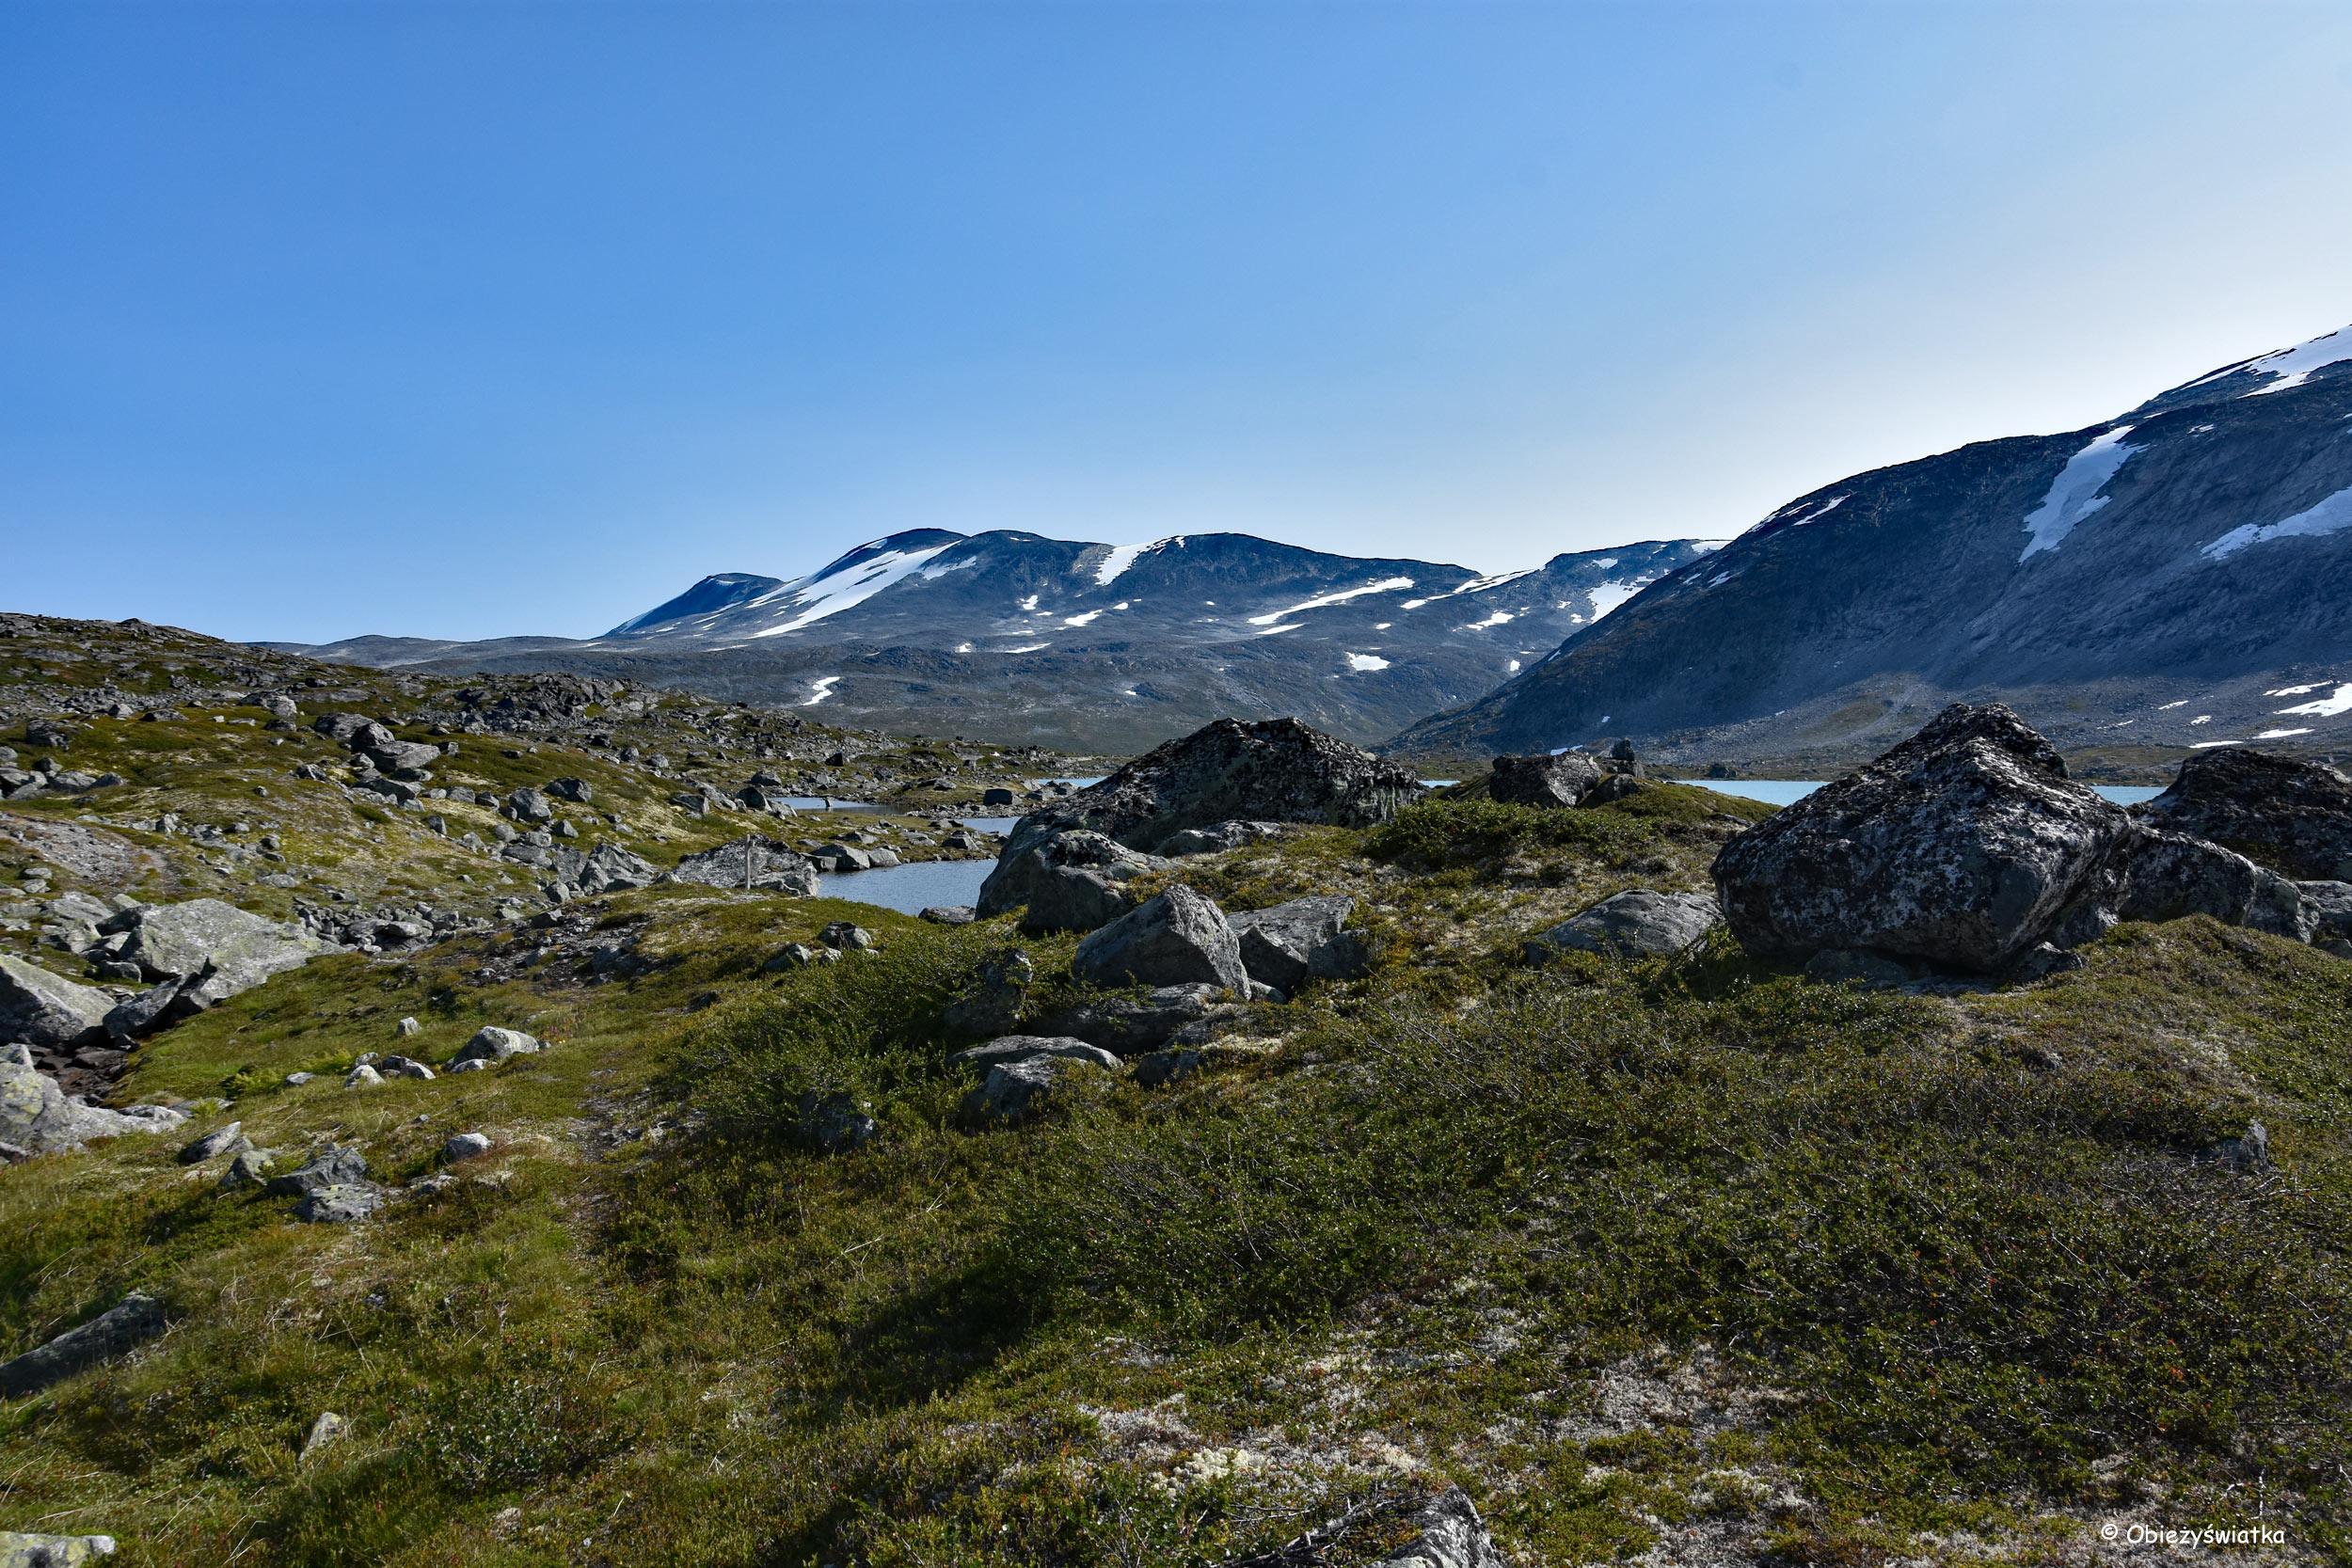 Pustka - Gamle Strynefjellsvegen, Norwegia